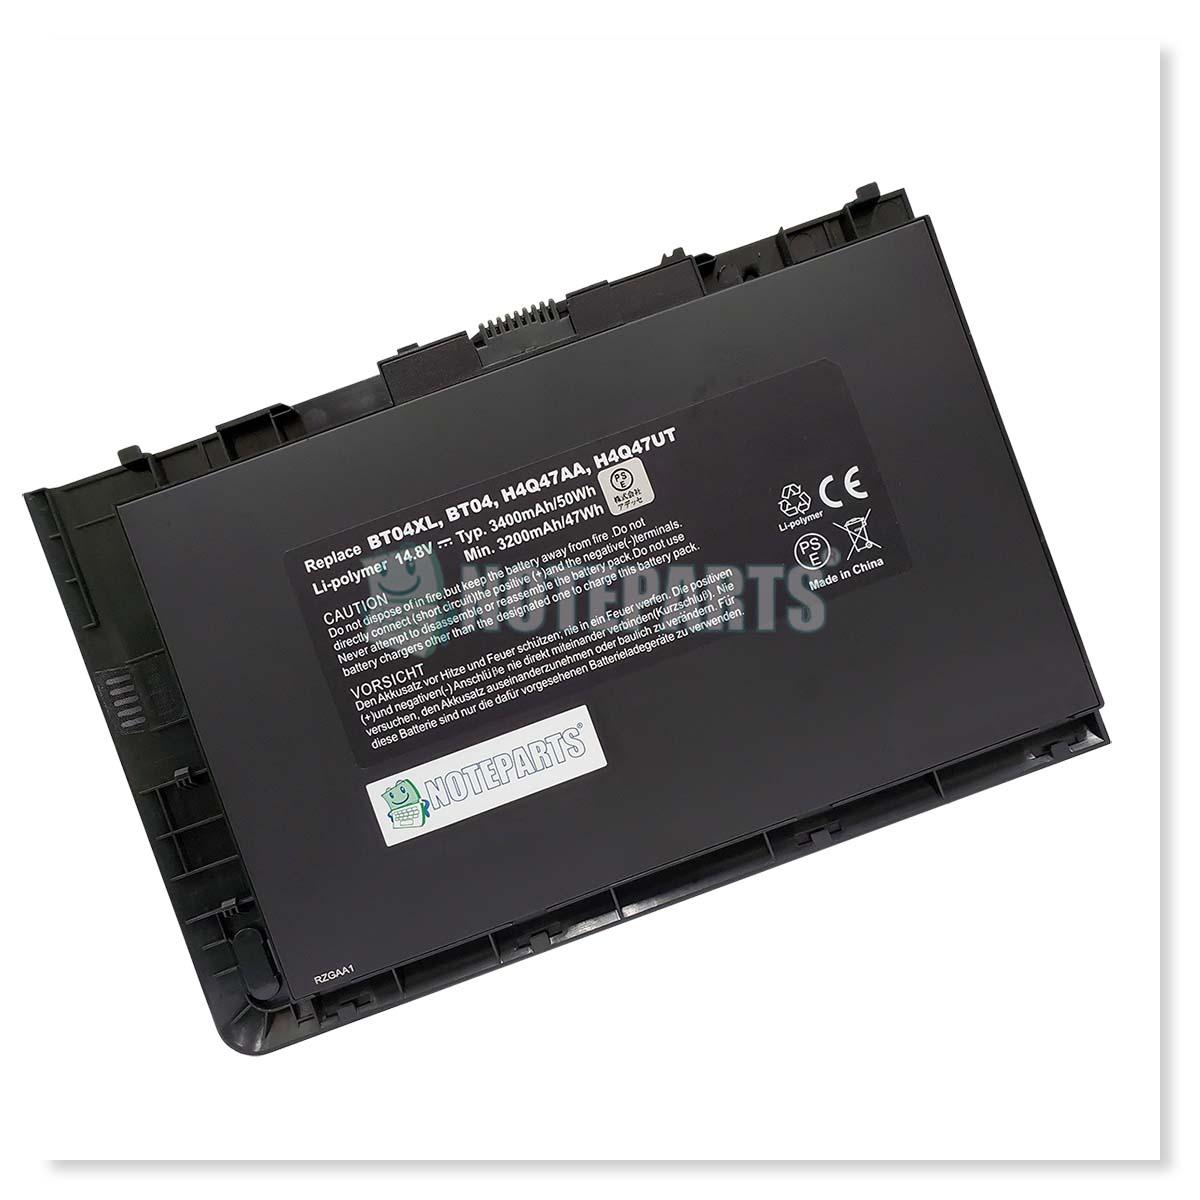 HP EliteBook Folio 9470m バッテリー BT04 BT04XL H4Q47AA H4Q47UT対応